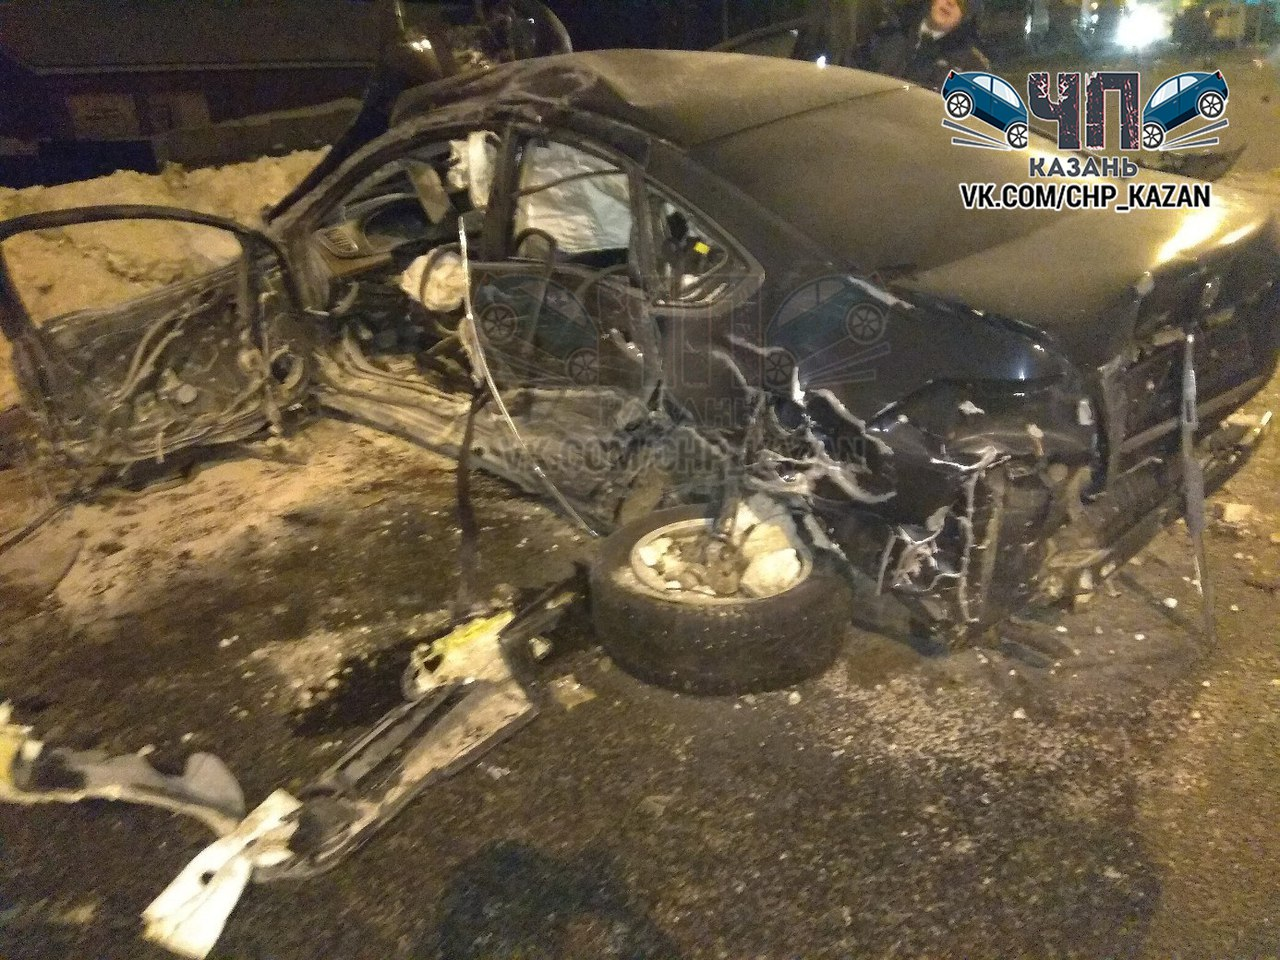 В Казани иномарка снесла столб и обрушила конструкцию на два других авто (ФОТО, ВИДЕО)